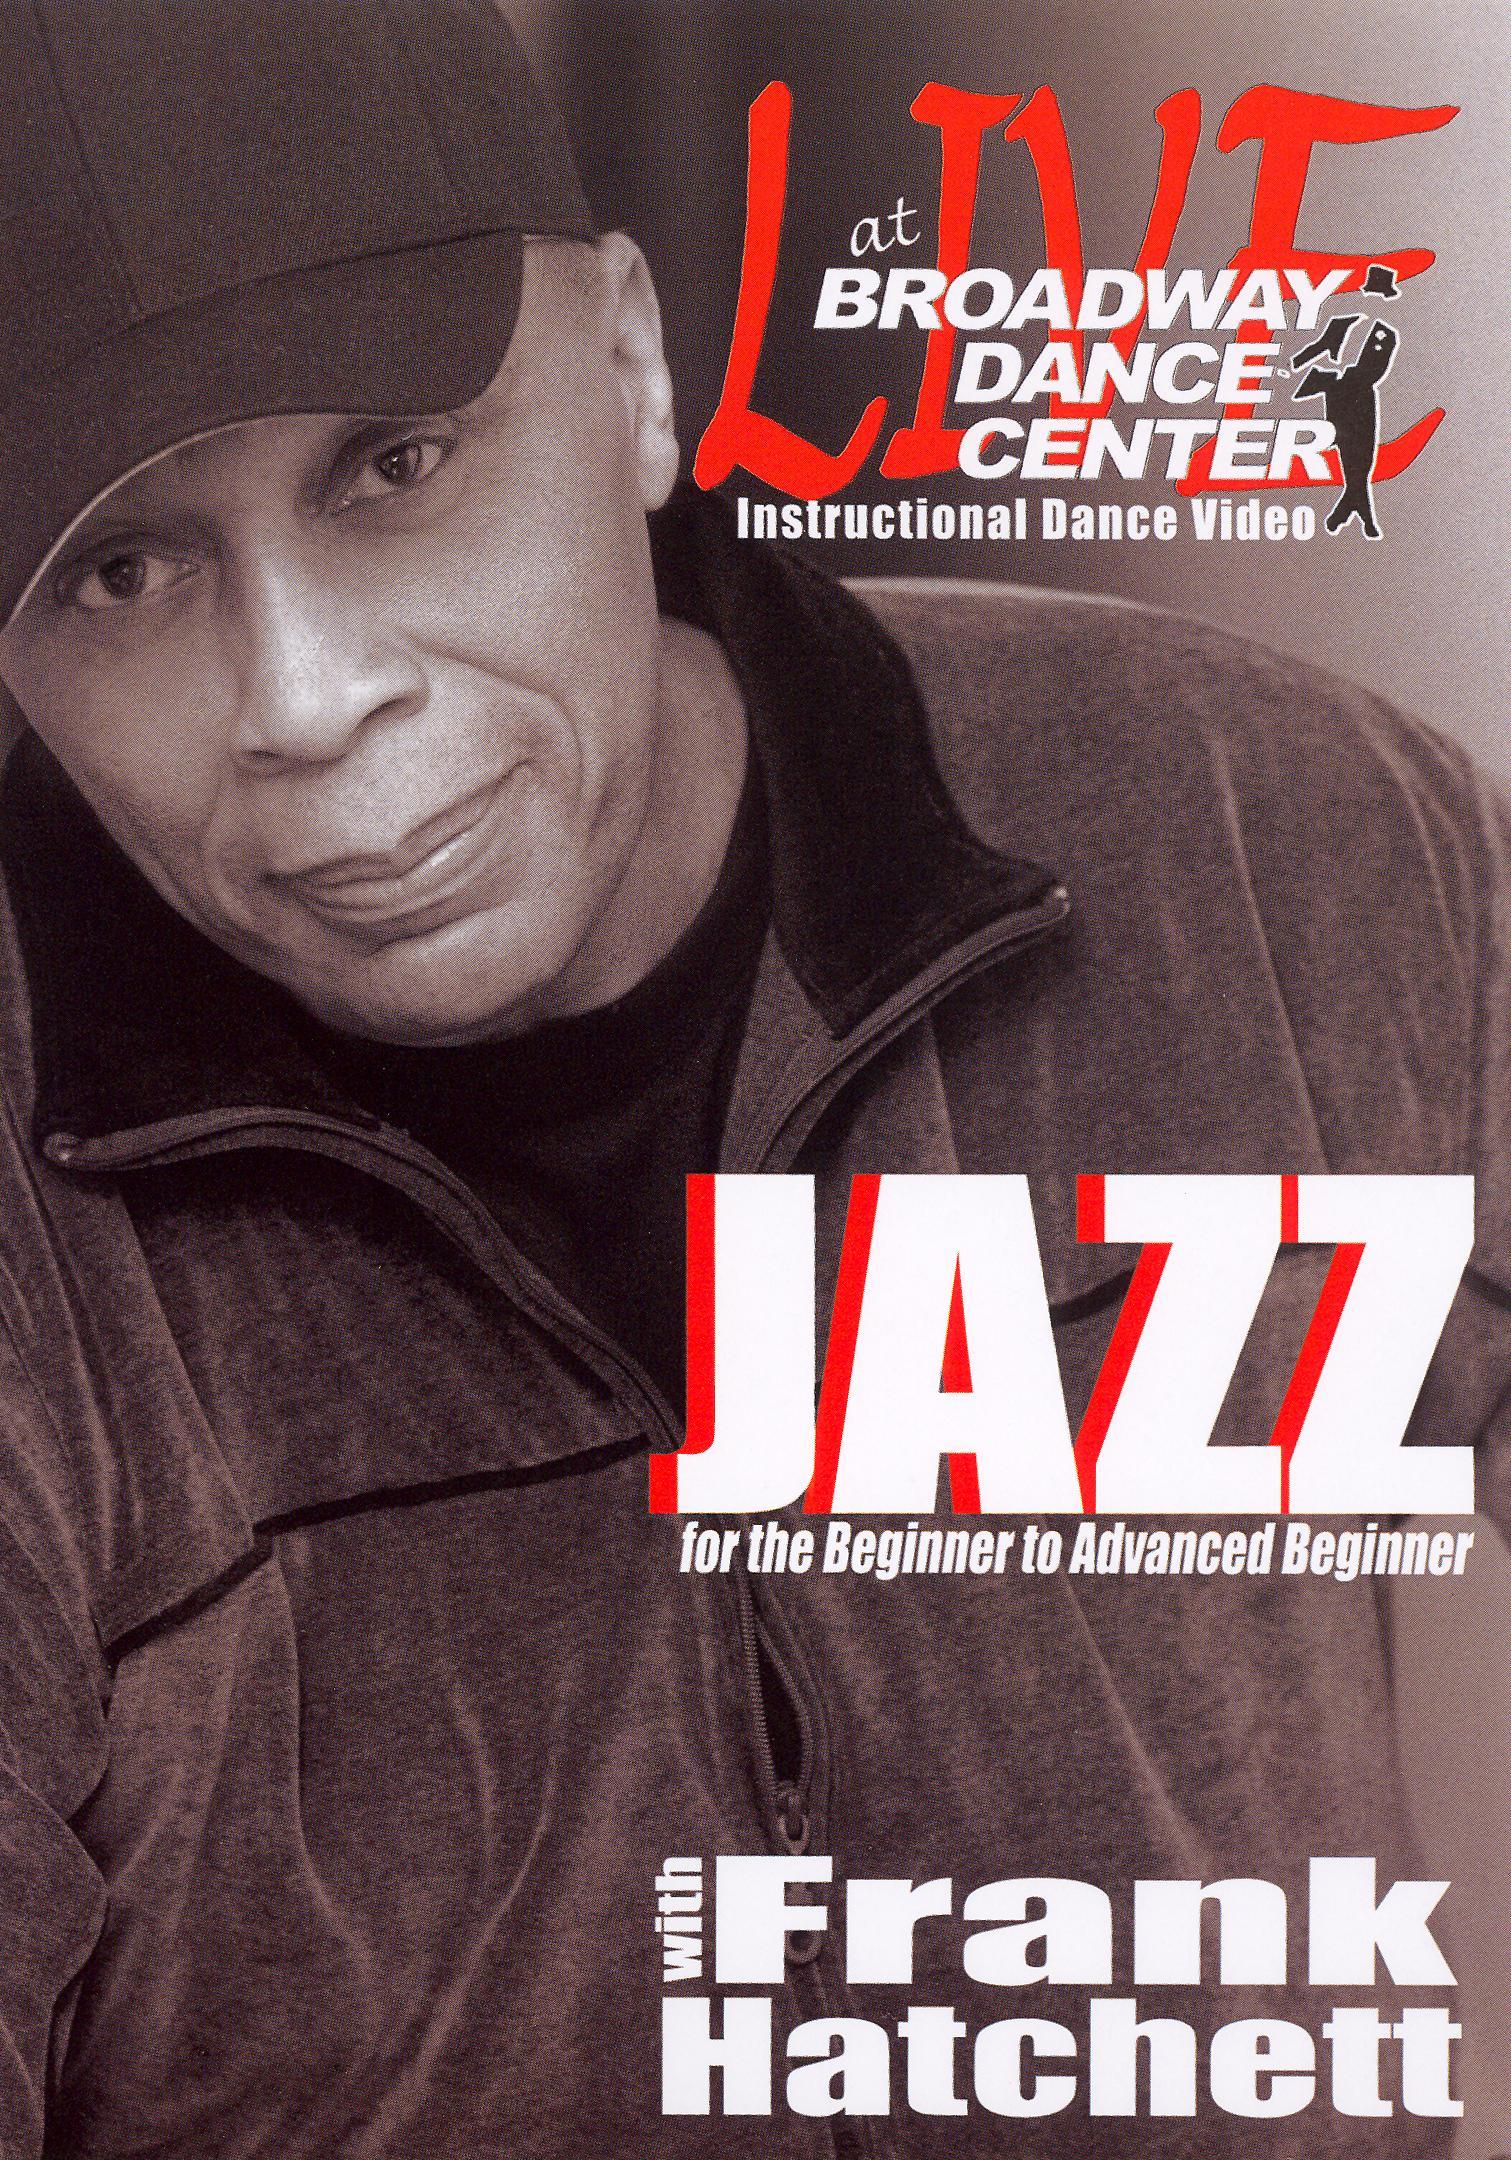 Broadway Dance Center: Jazz for the Beginner to Advanced Beginner